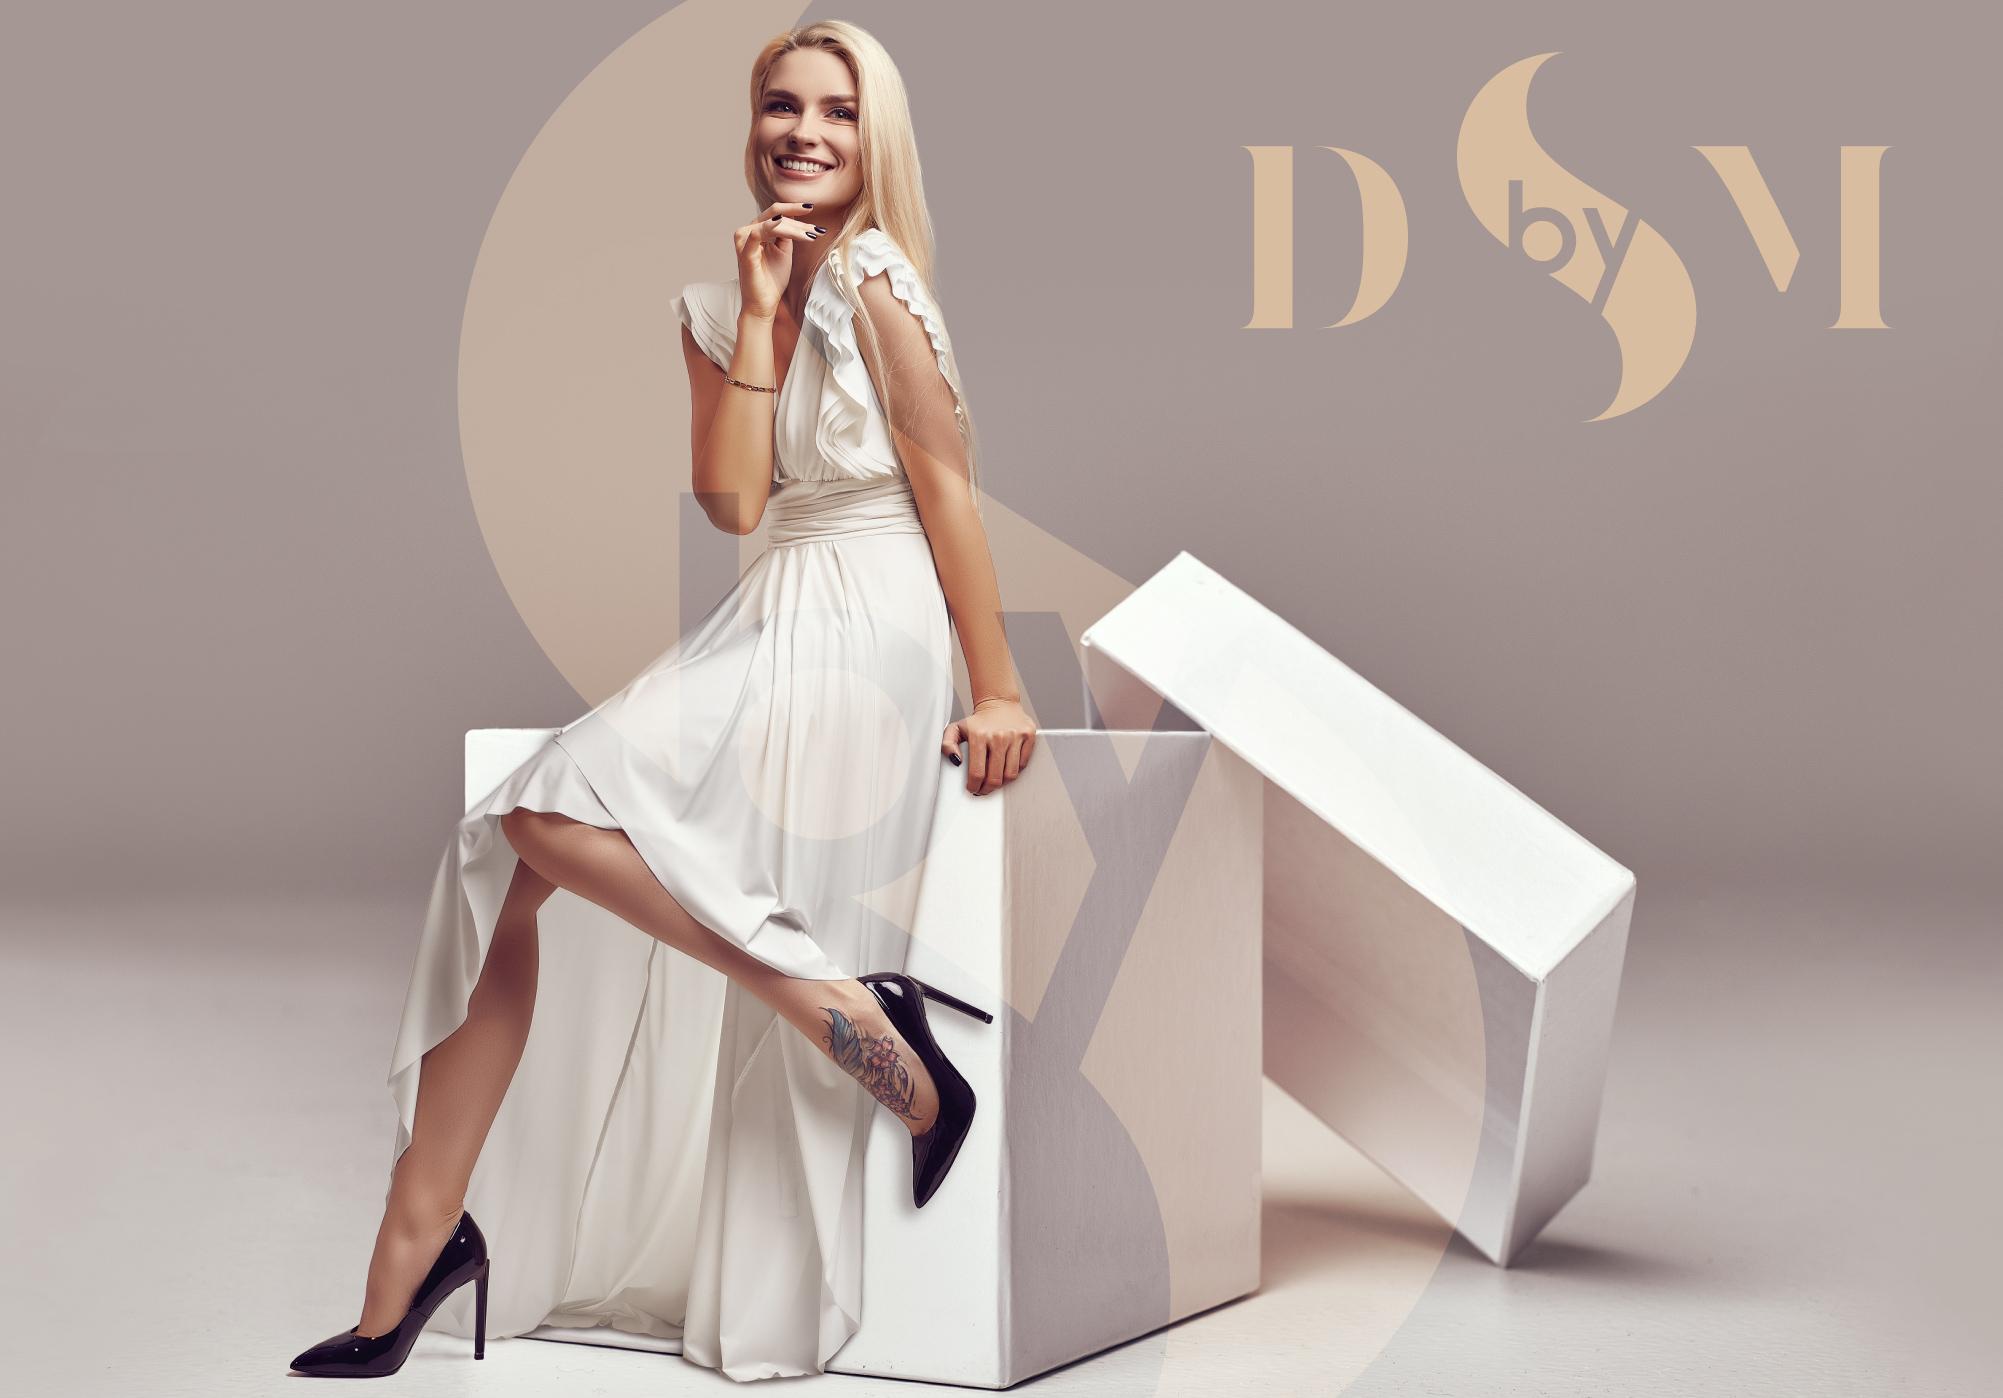 projekt logo by DSM ver 1-03